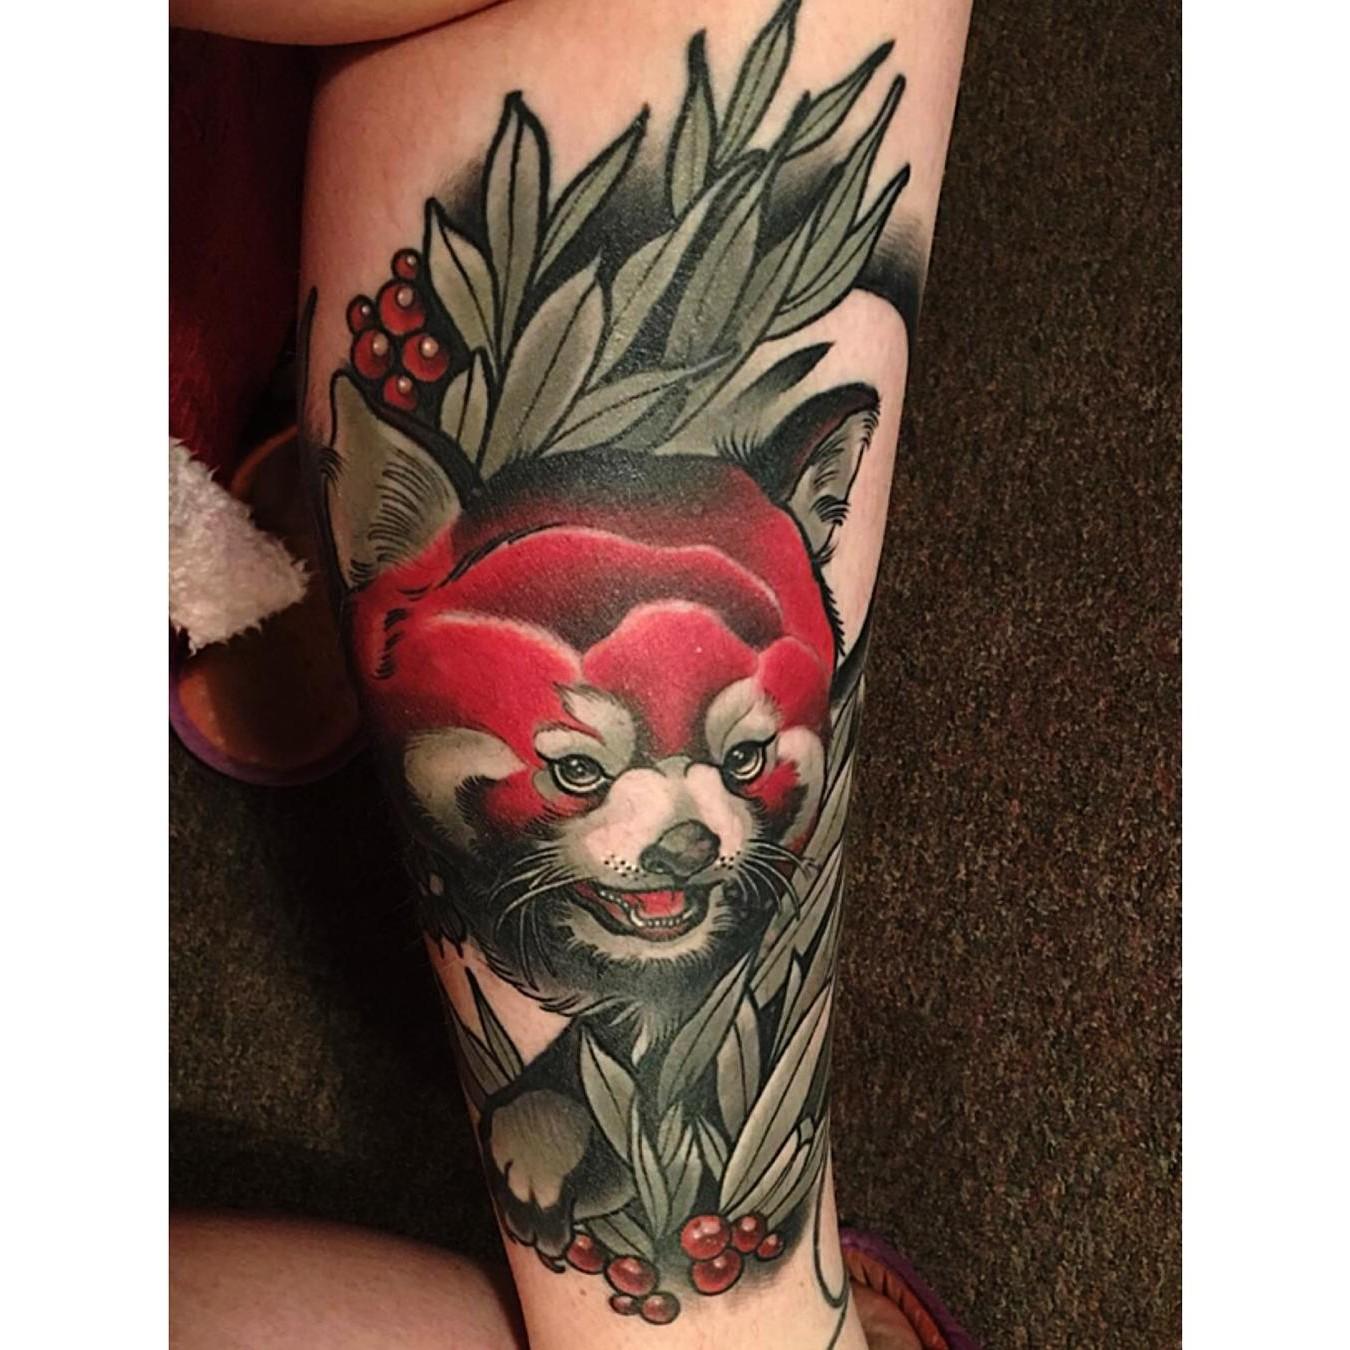 Tattoo johnny design gallery